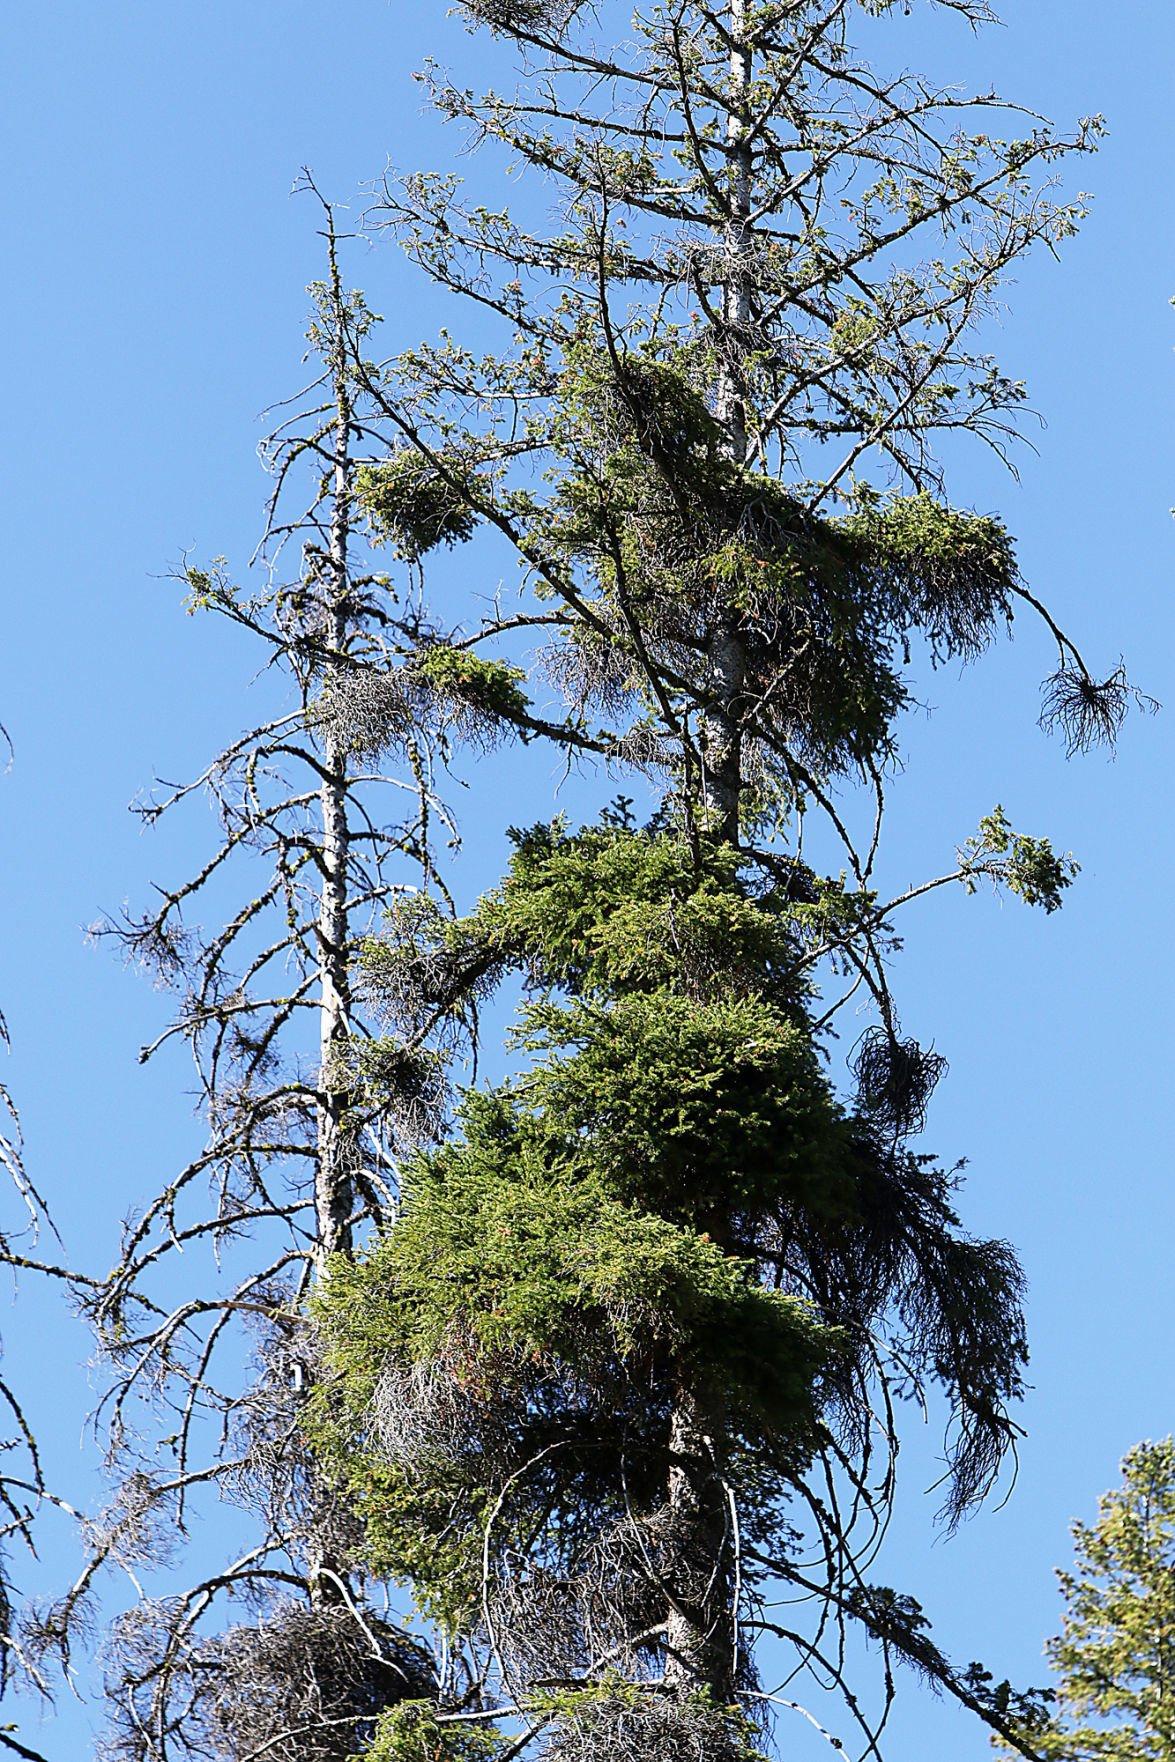 Bogus Basin tree removal